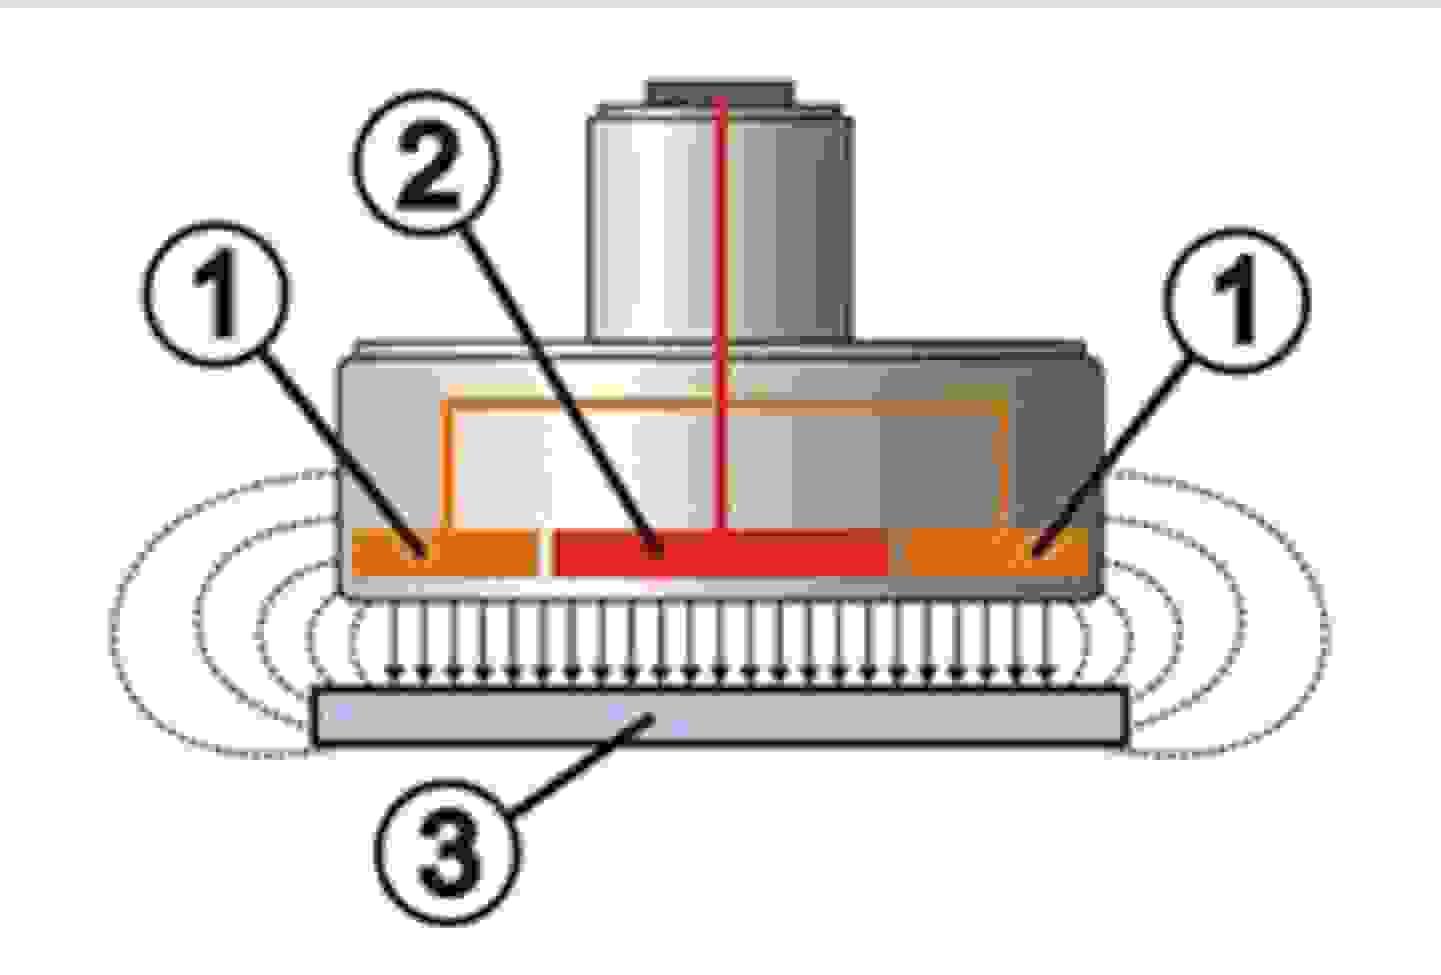 Skizze des Messvorgangs eines Kapazitiven Sensors